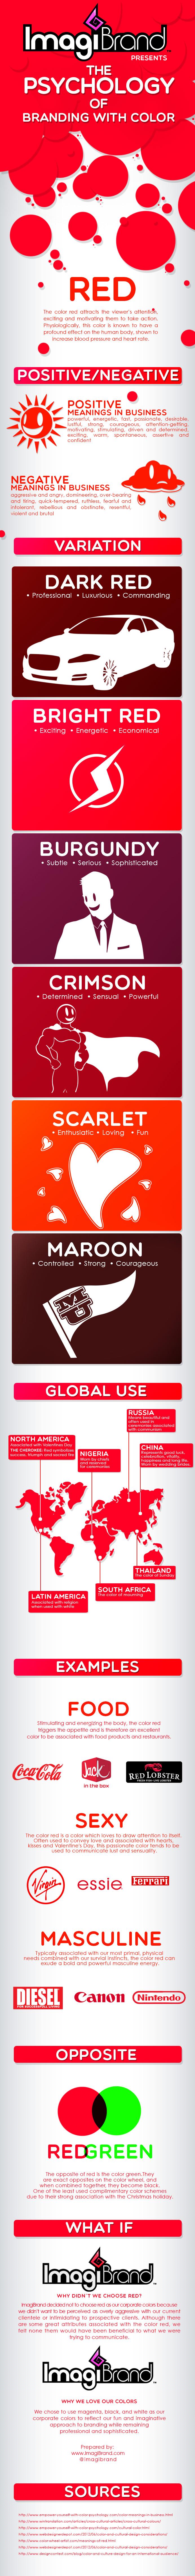 Branding de color rojo